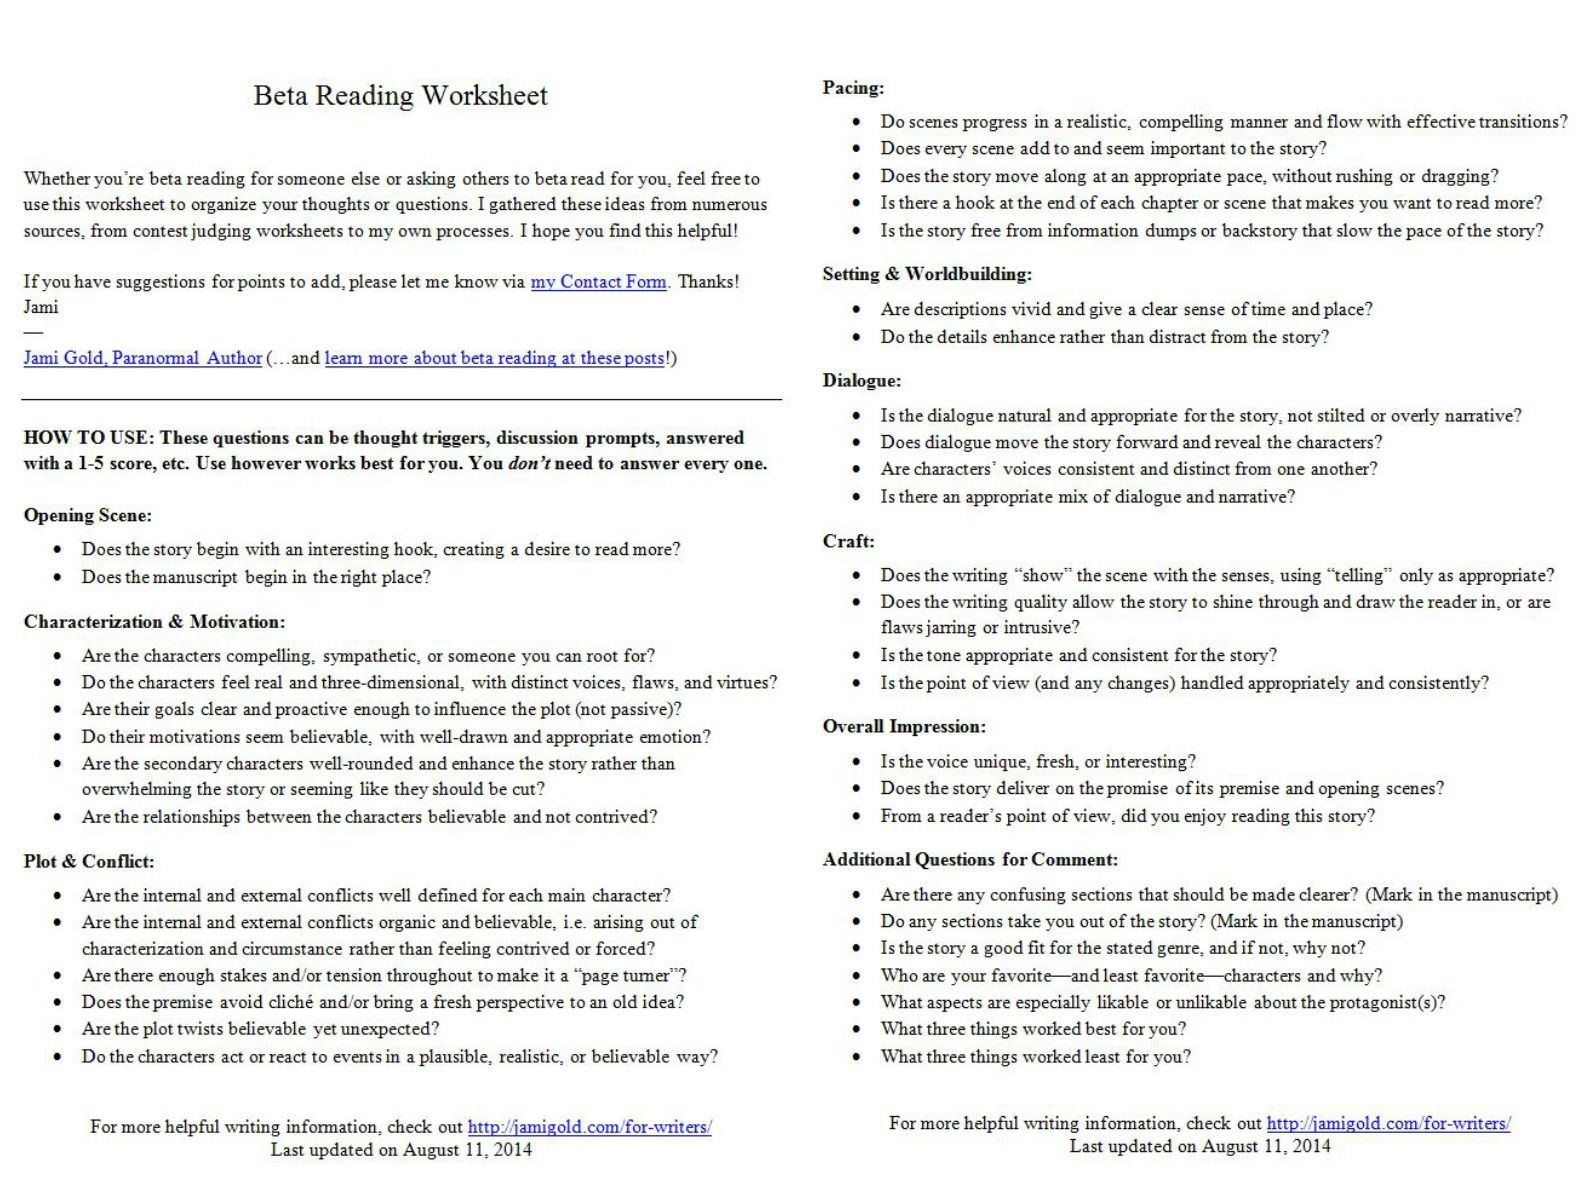 Introducing The Beta Reading Worksheet